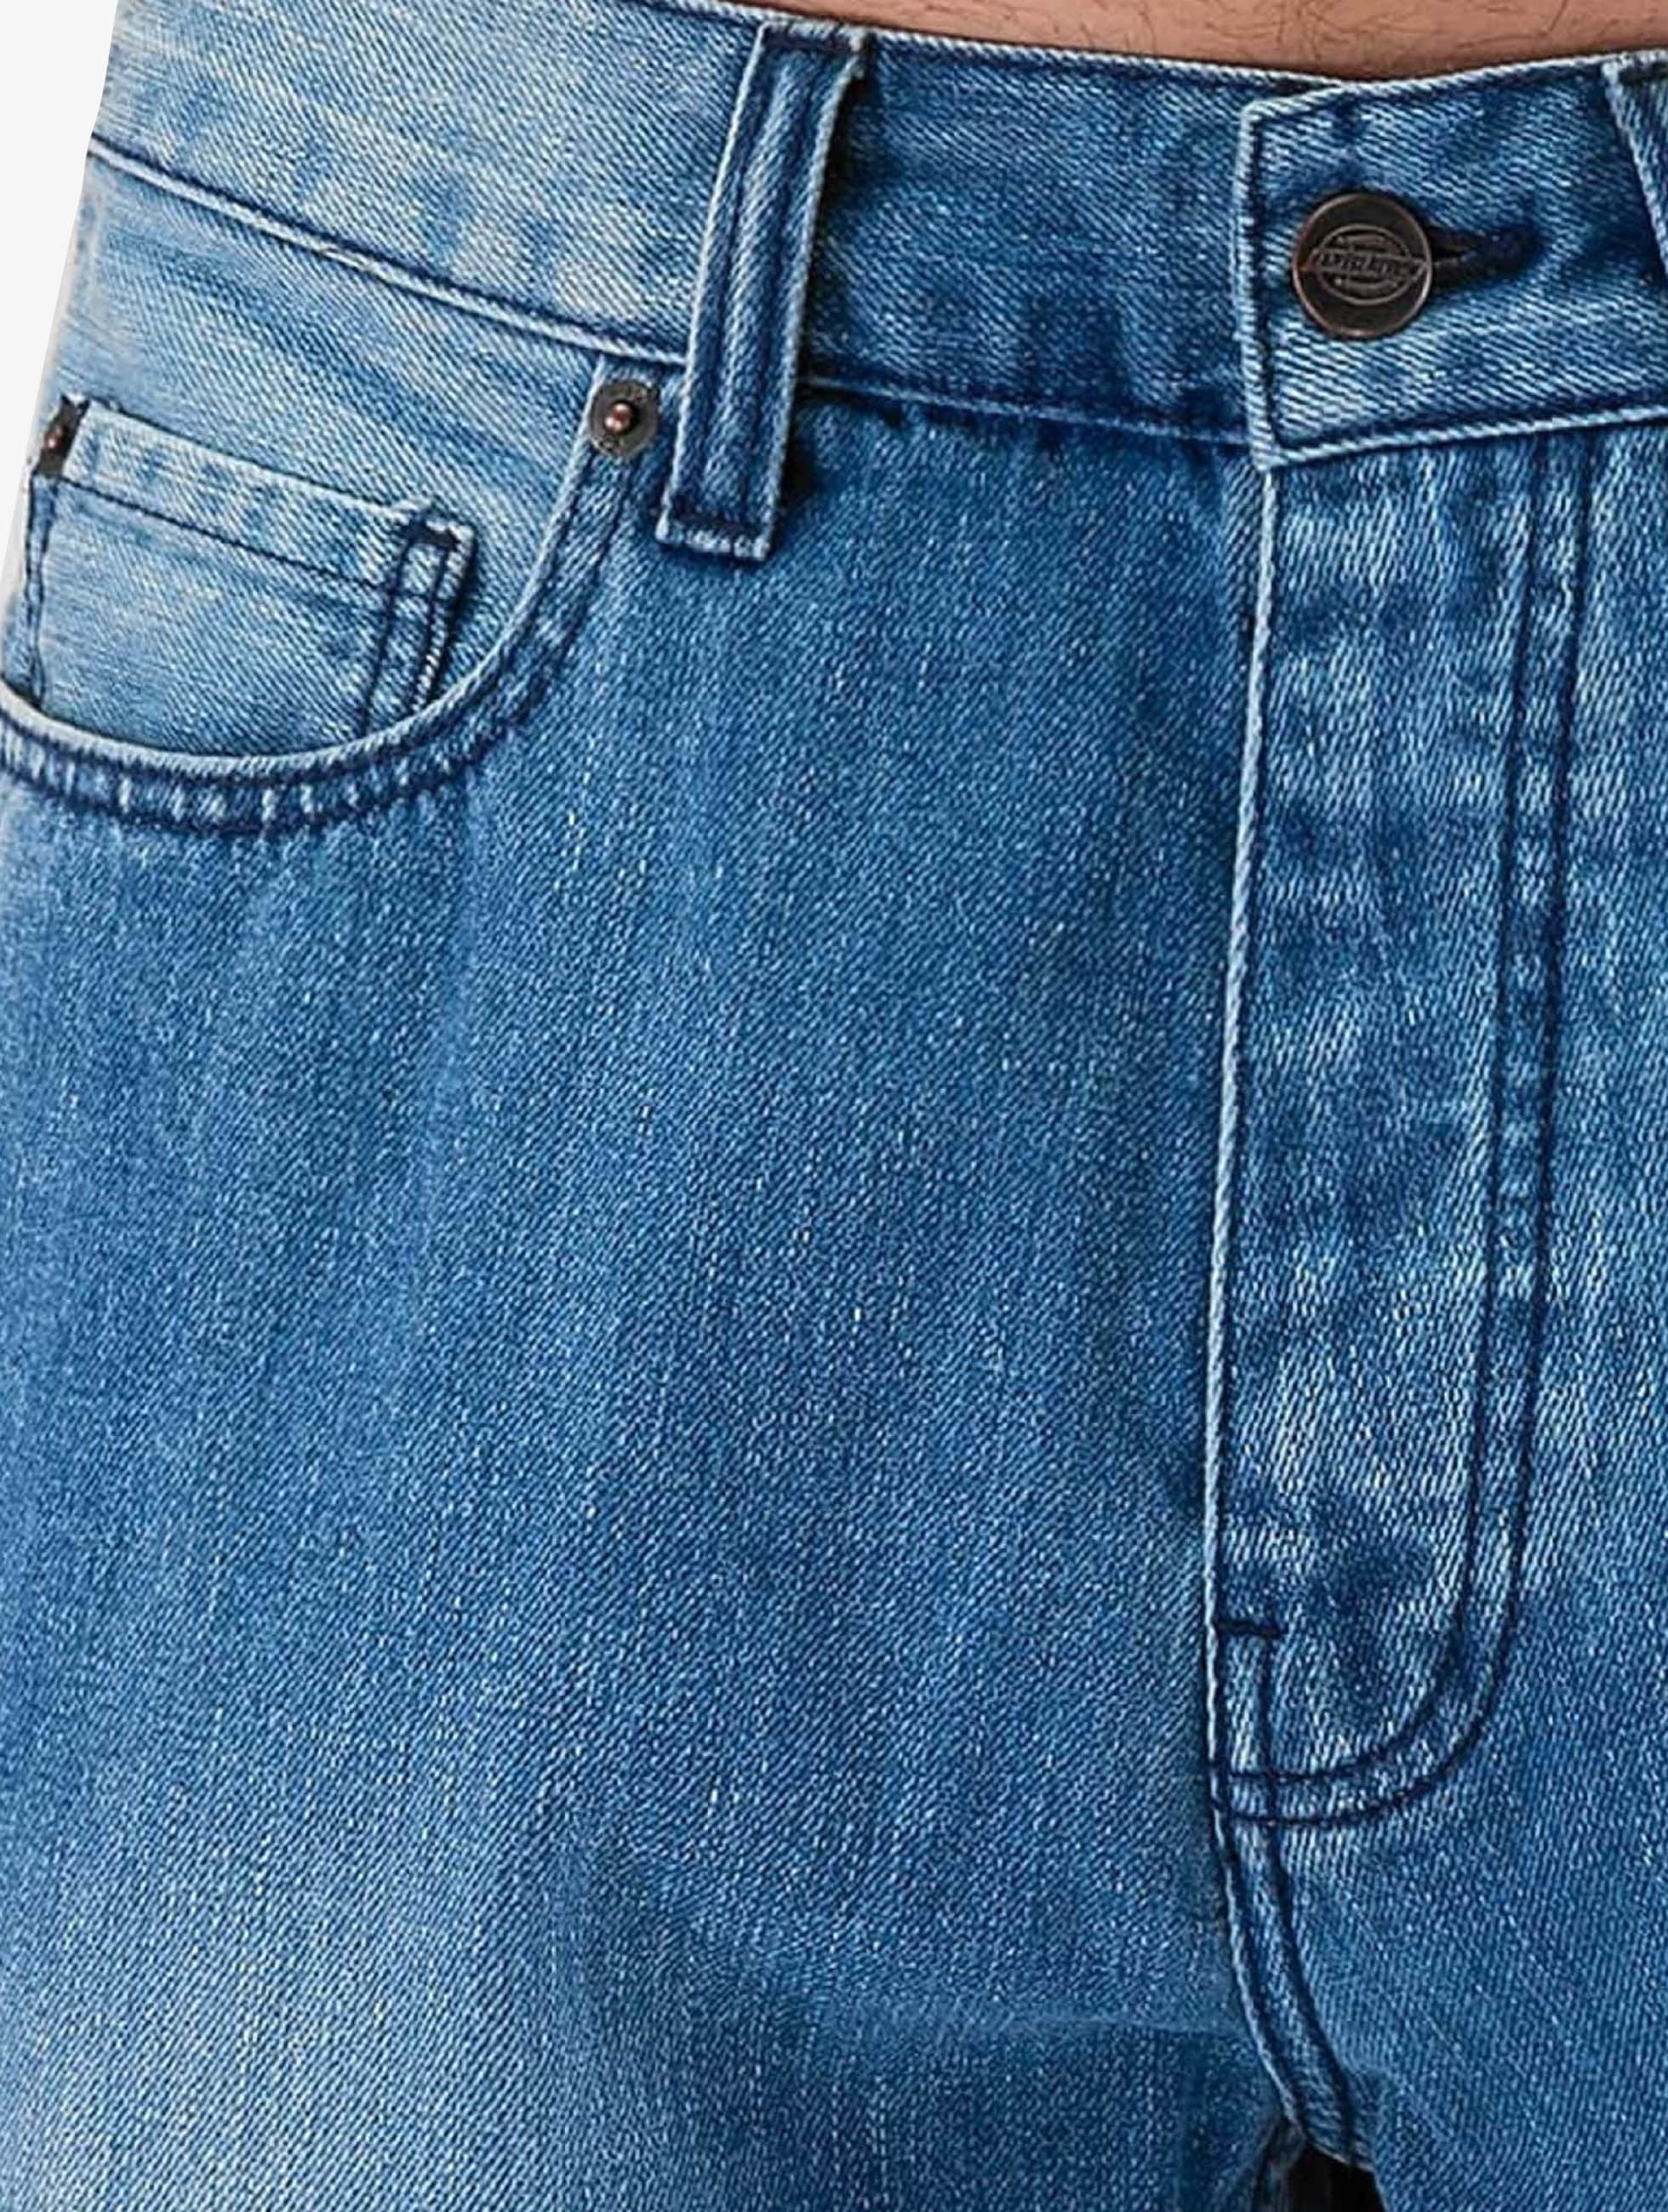 dickies pensacola bleu homme jean large dickies acheter pas cher jean 266498. Black Bedroom Furniture Sets. Home Design Ideas